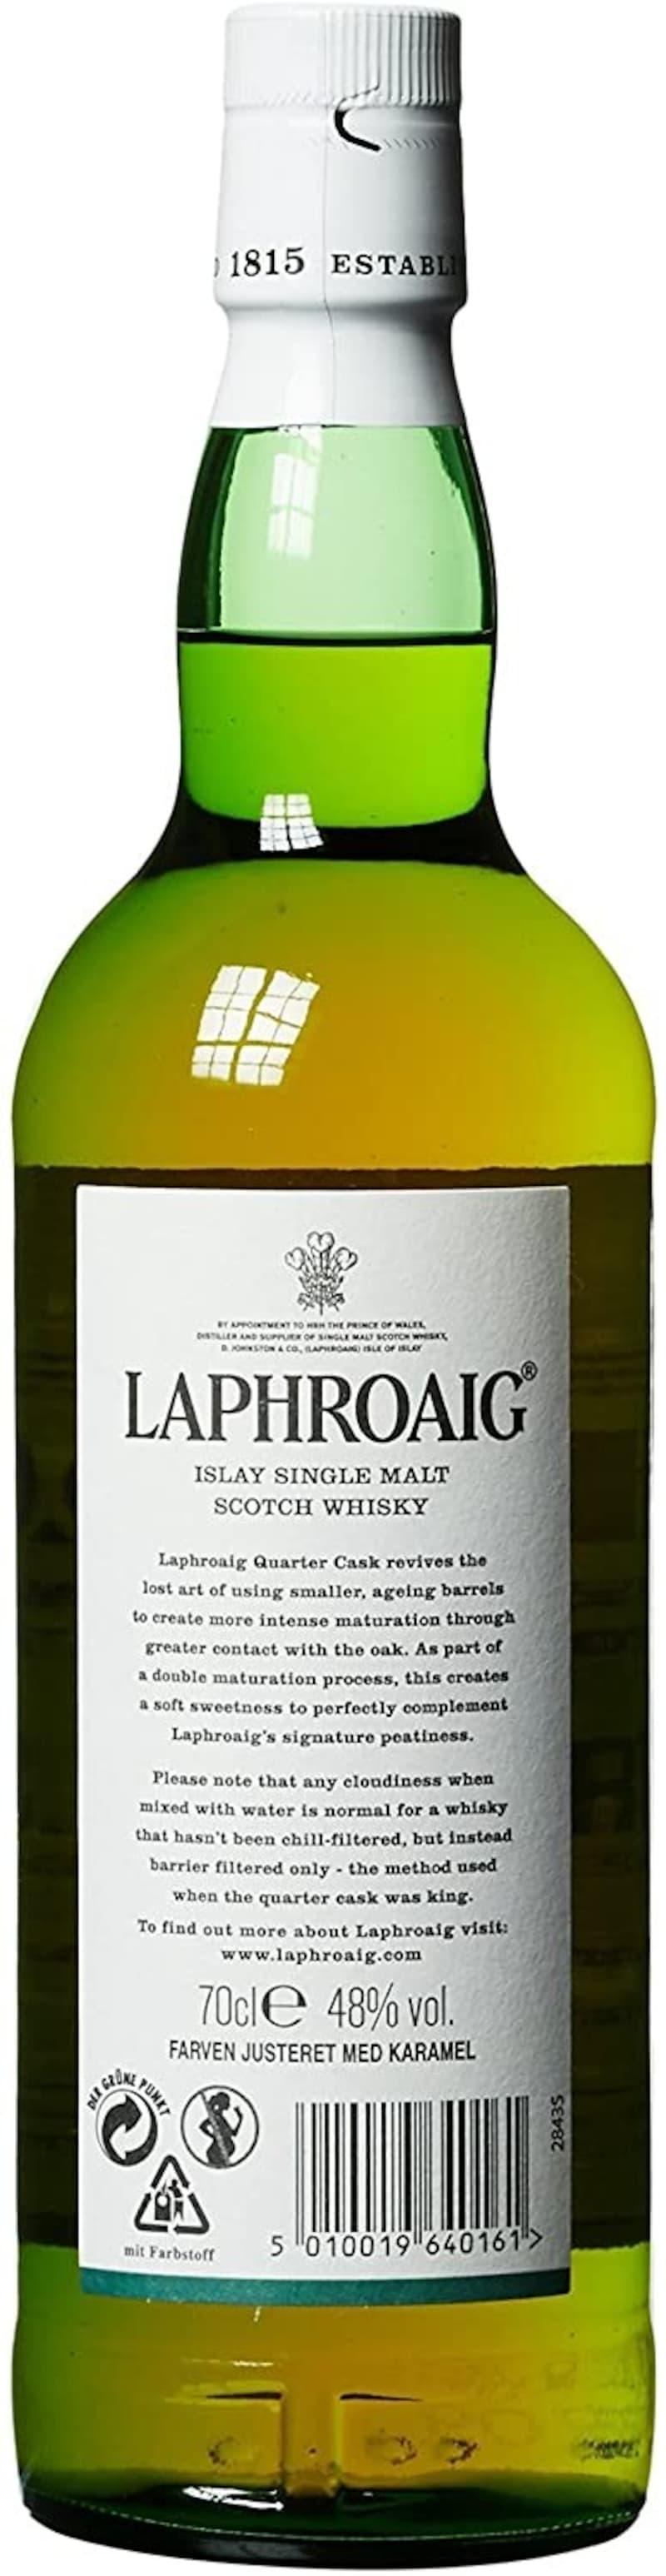 LAPHROAIG(ラフロイグ),ラフロイグ クオーターカスク